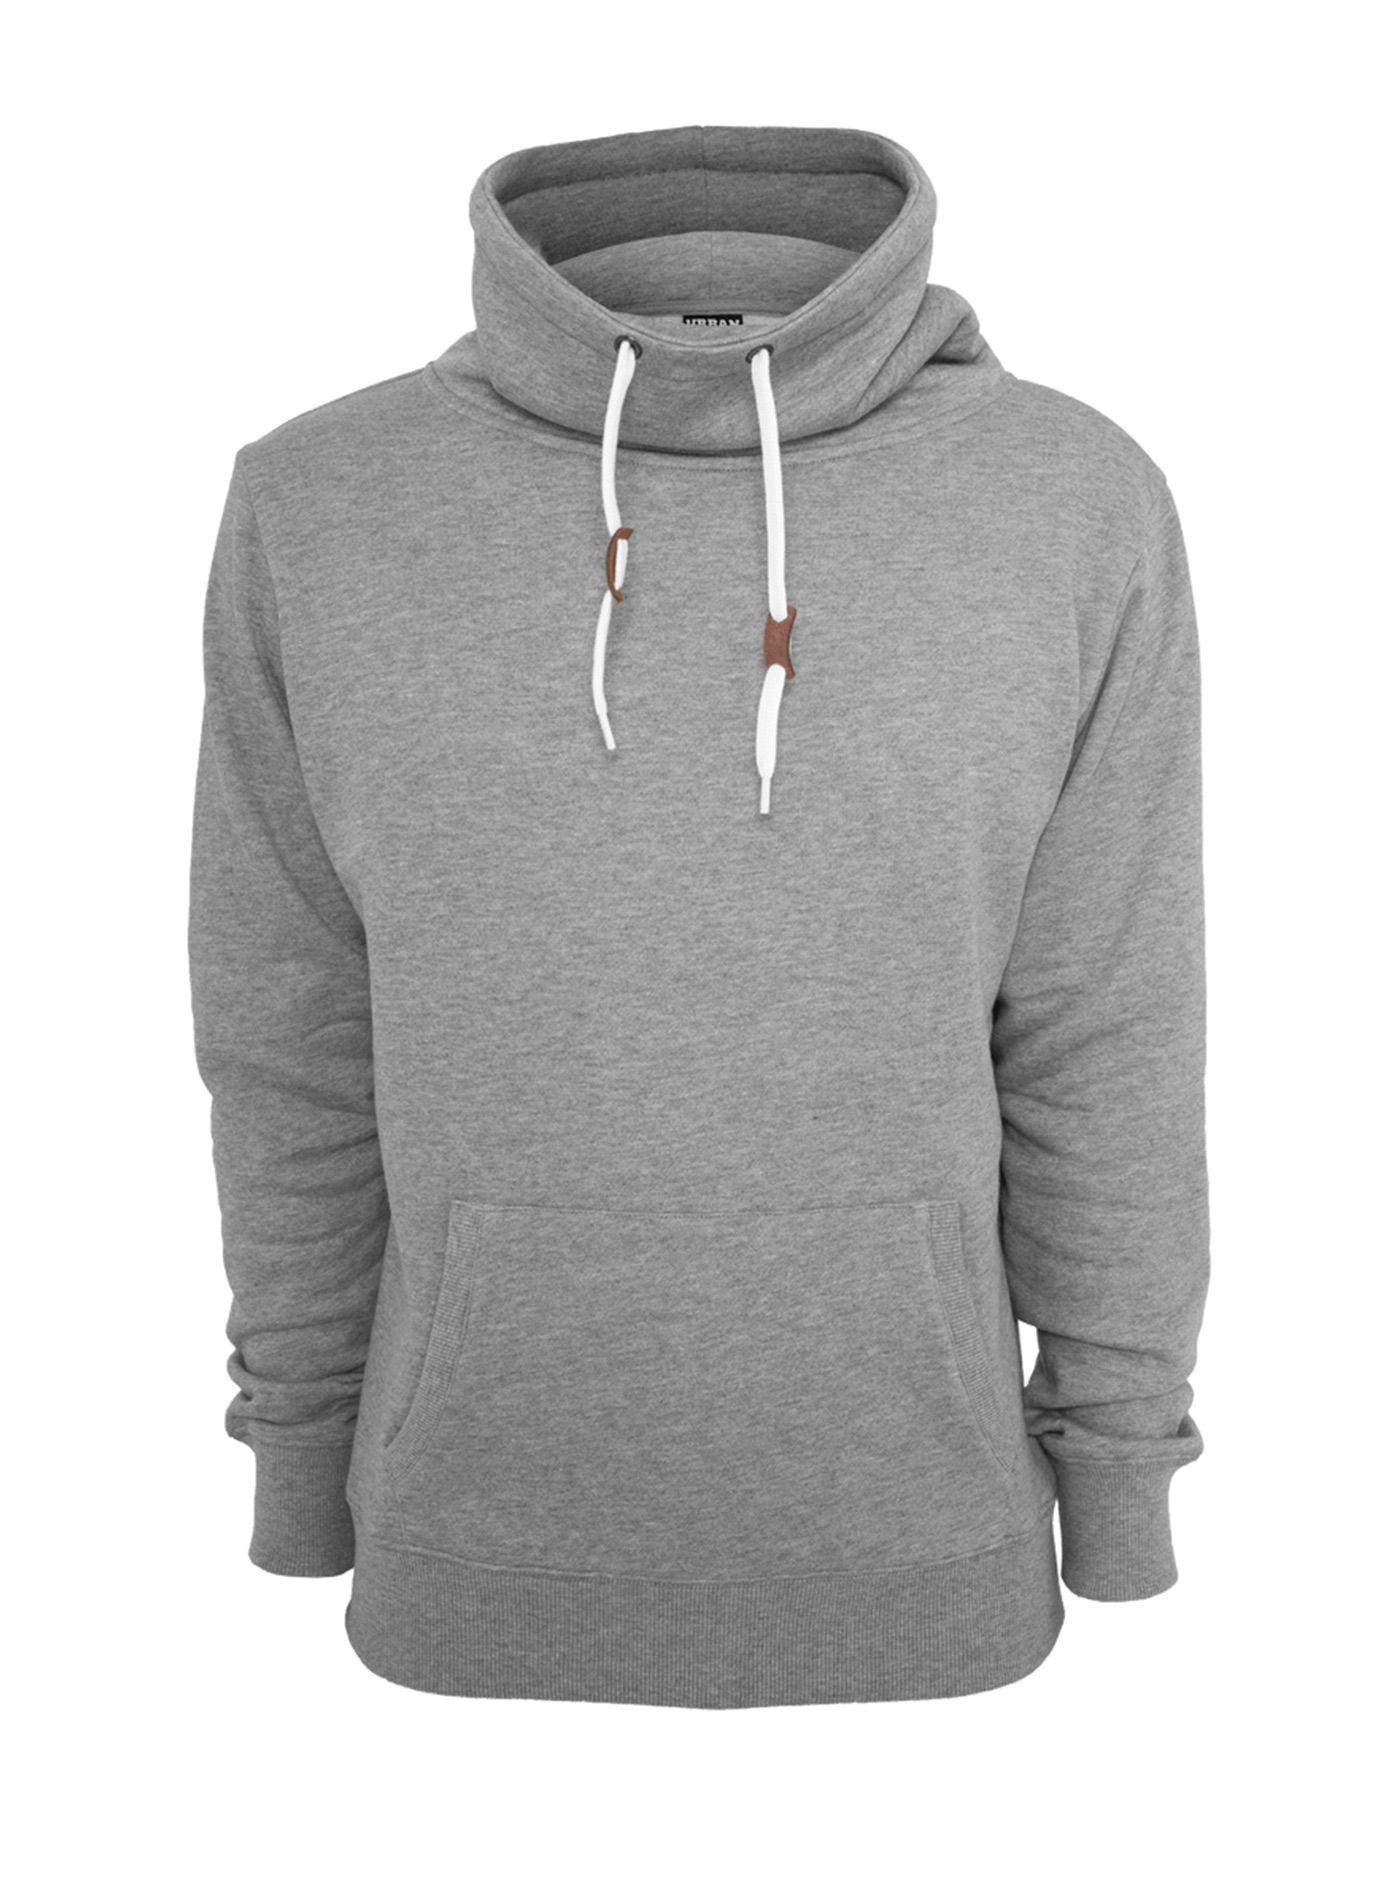 7ded81e9f Sweatshirt Urban Classics high Collar Hoodie High Neck ... | Animal ...